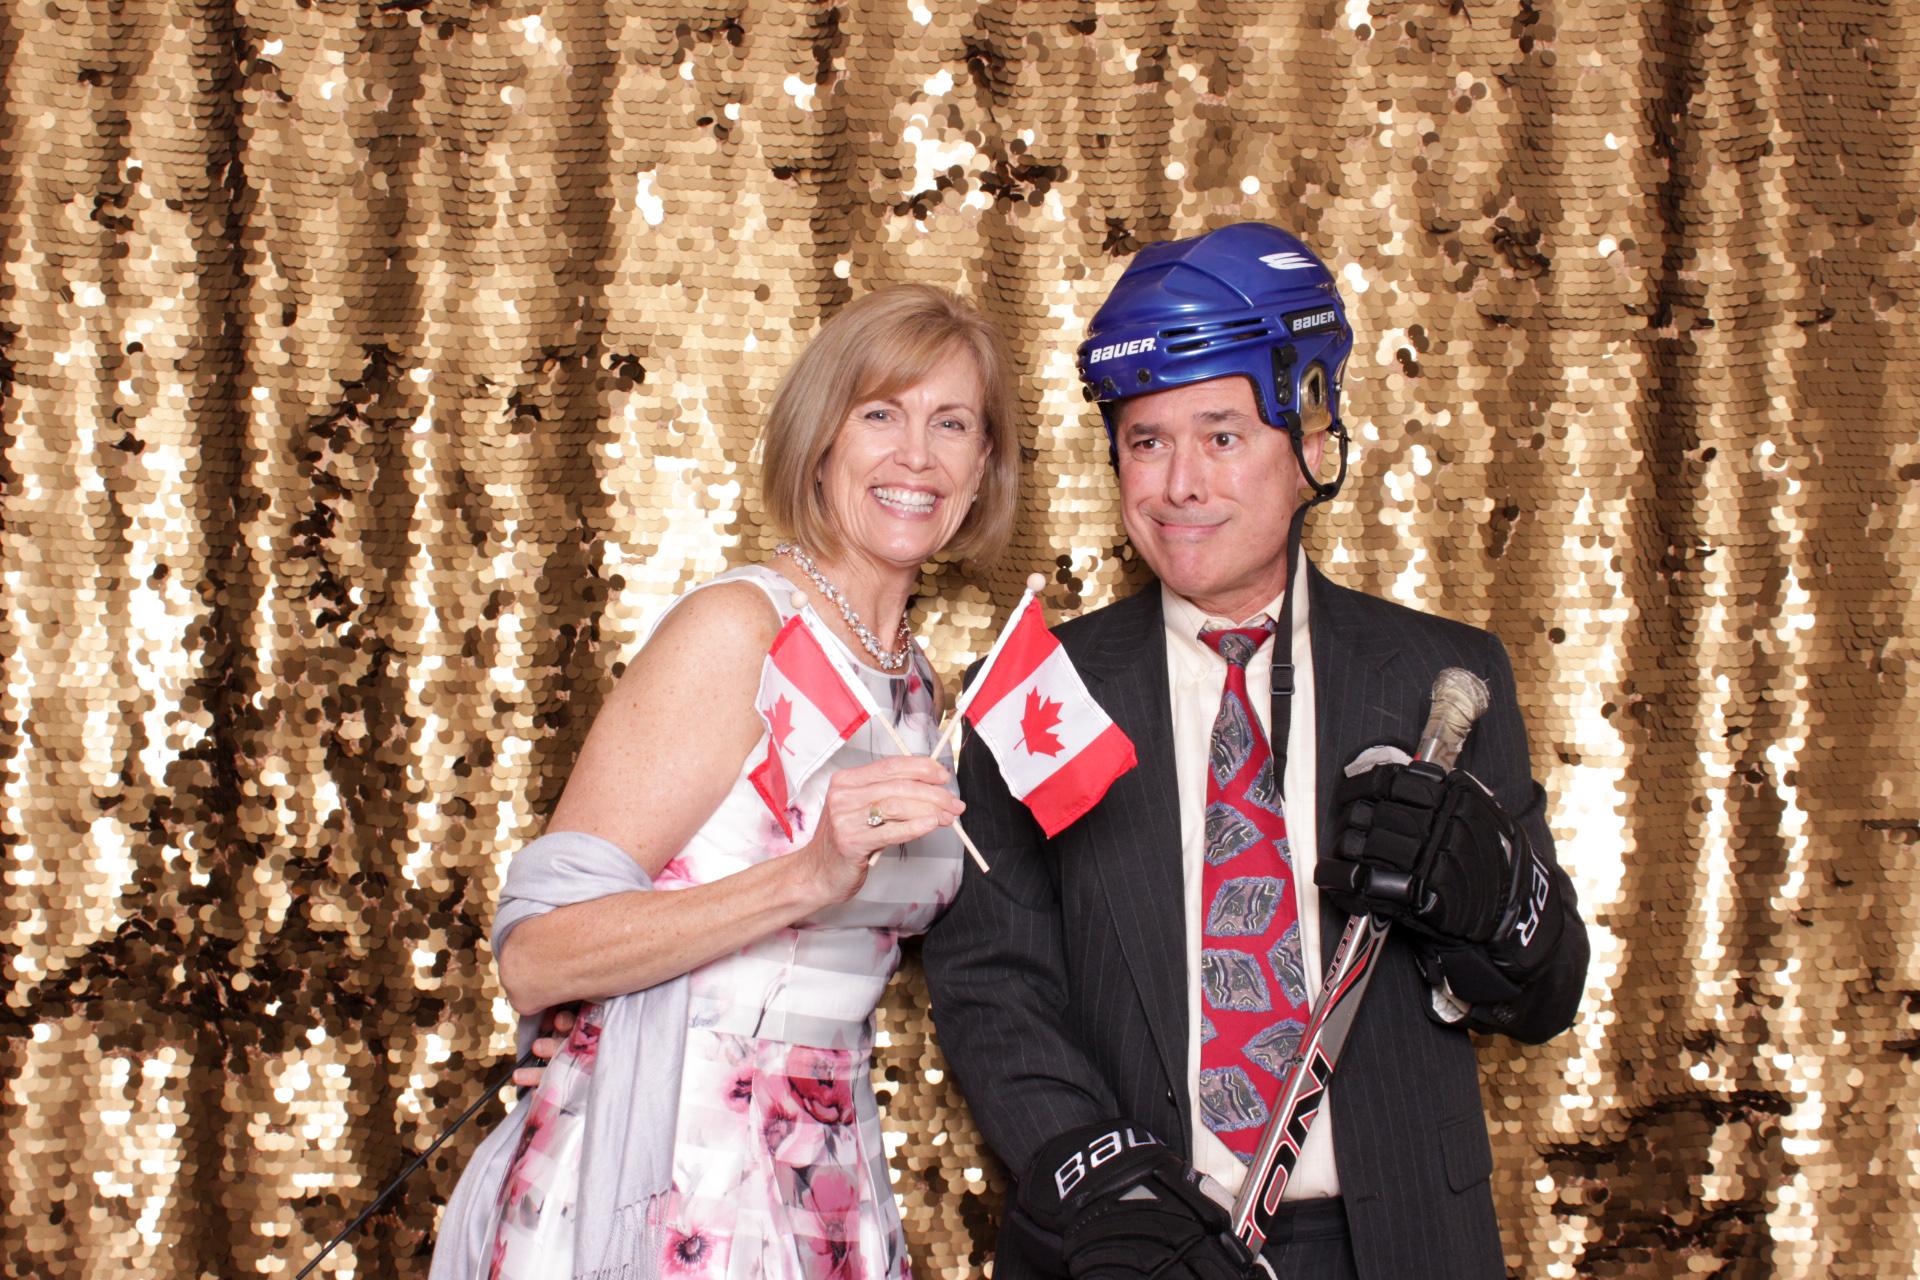 photo props canada flag hockey gear gold background